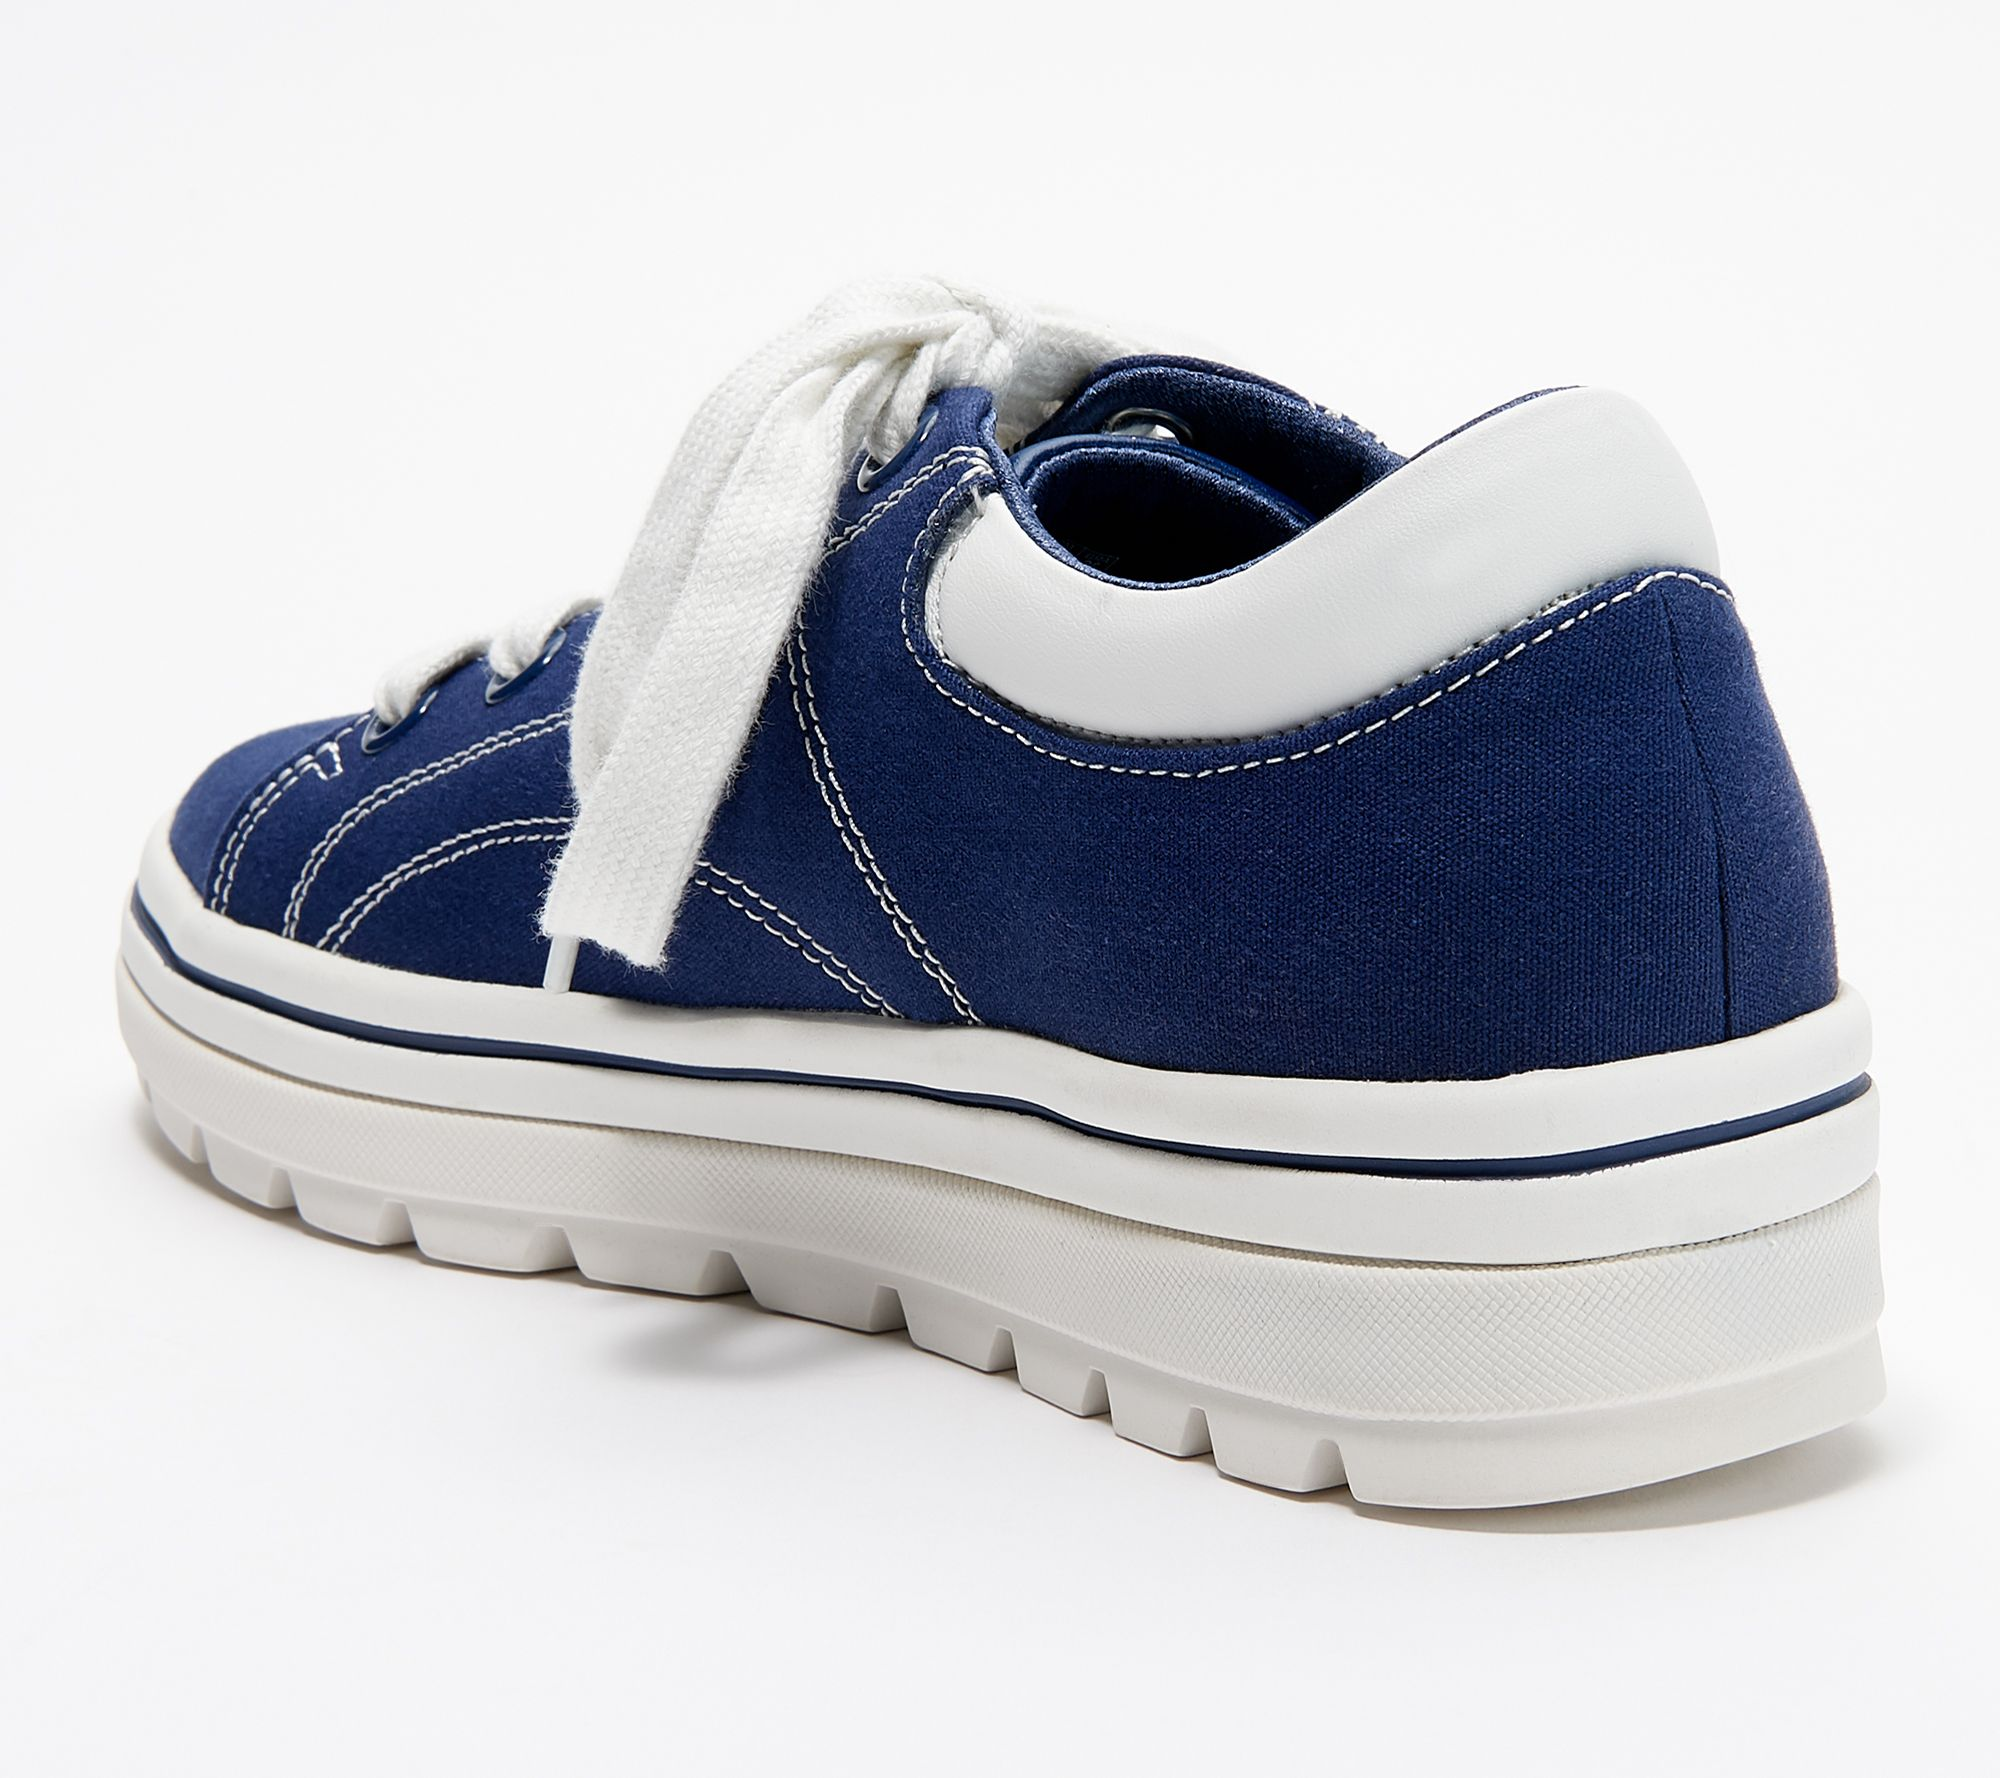 Skechers Street Cleats 2 Bring It Back Sneakers —